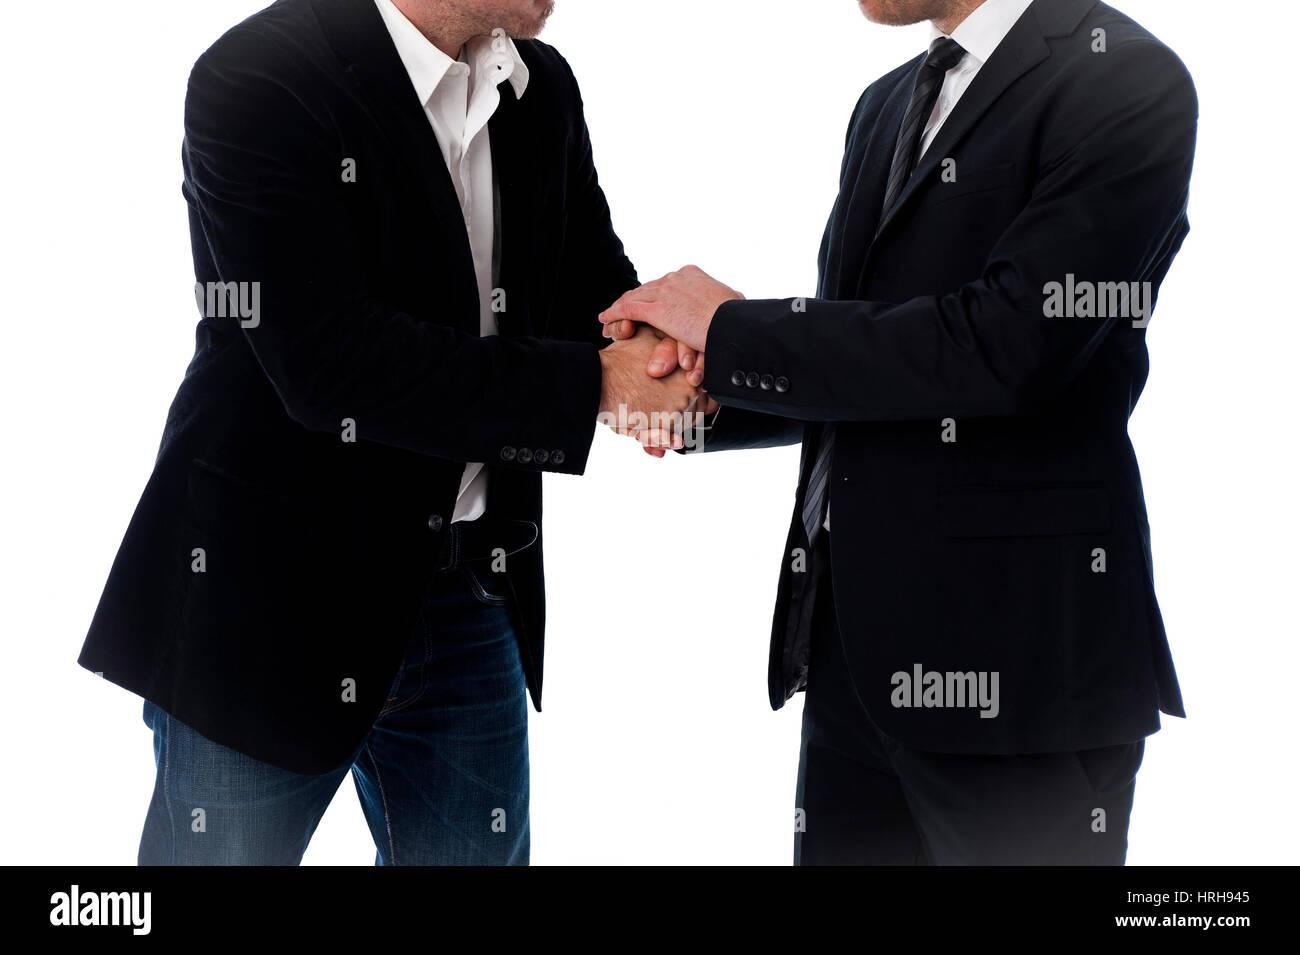 Model released, Handschlag unter Geschaeftsmaenner - handshake in business - Stock Image